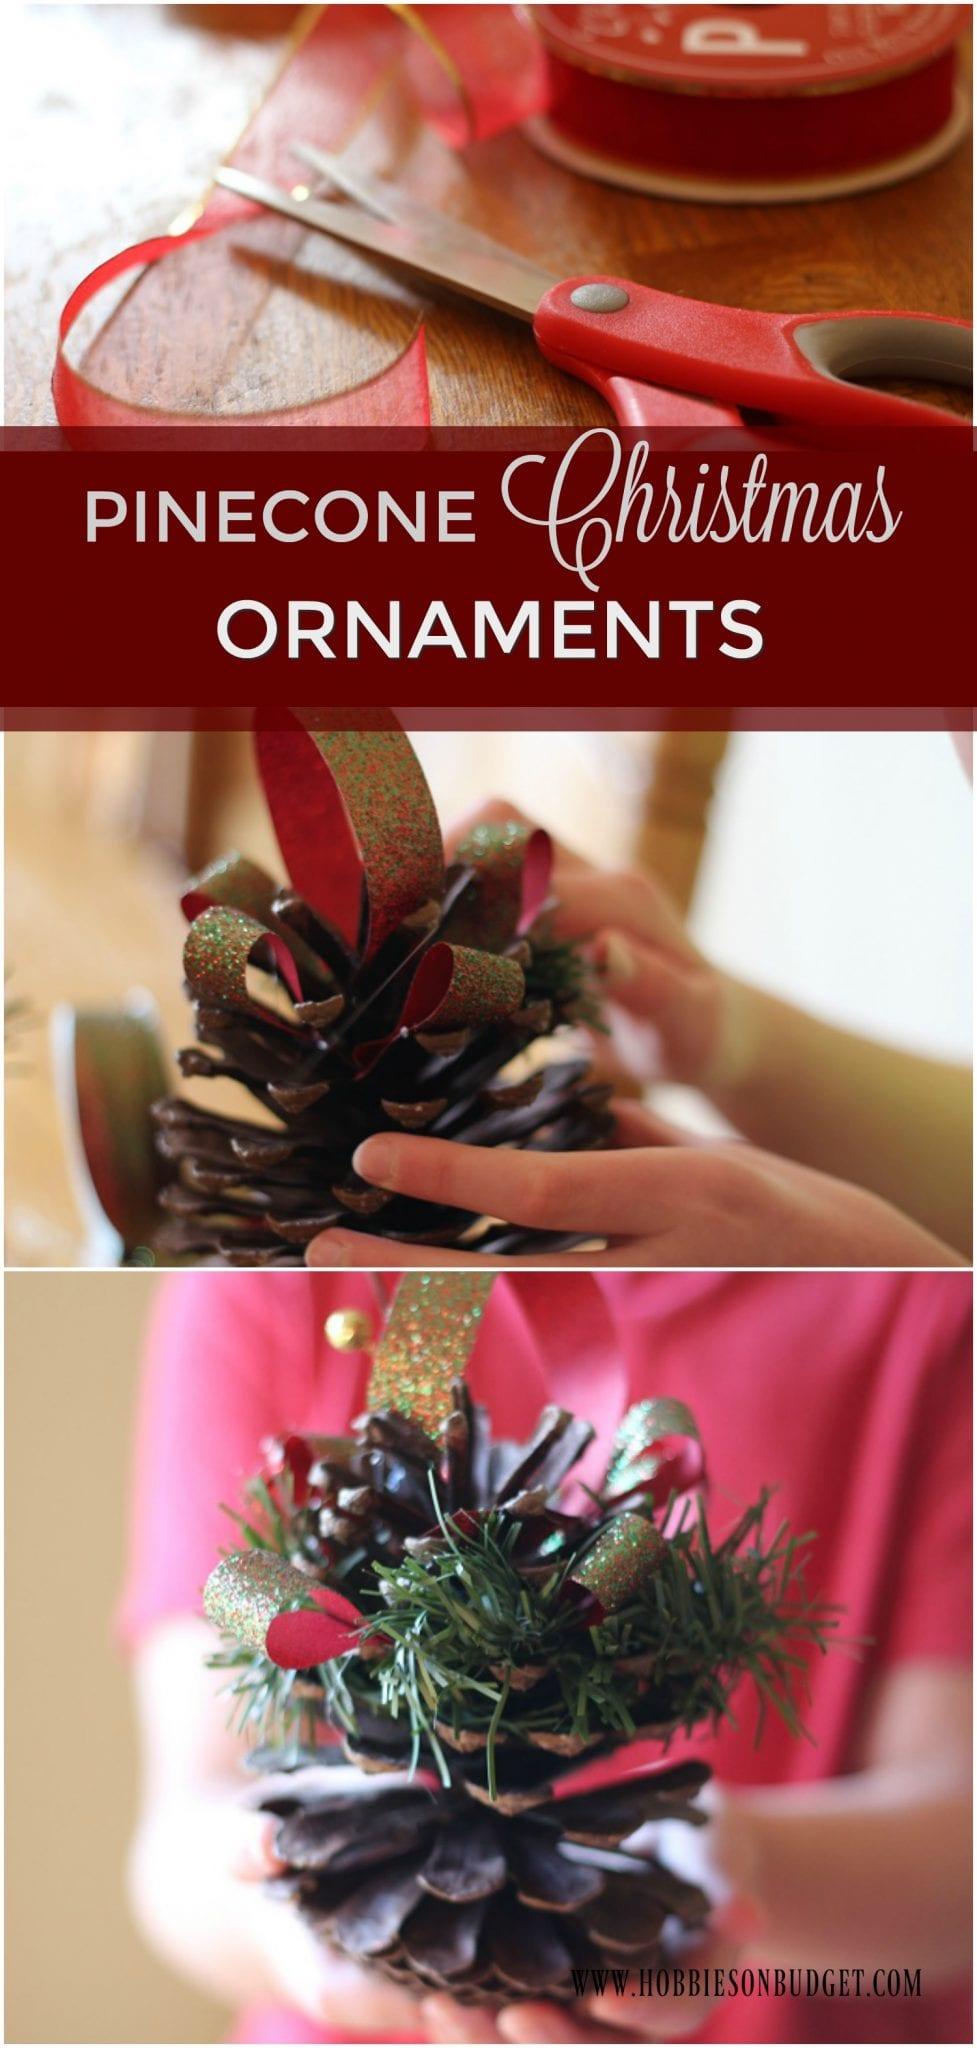 PINECONE CHRISTMAS ORNAMENTS